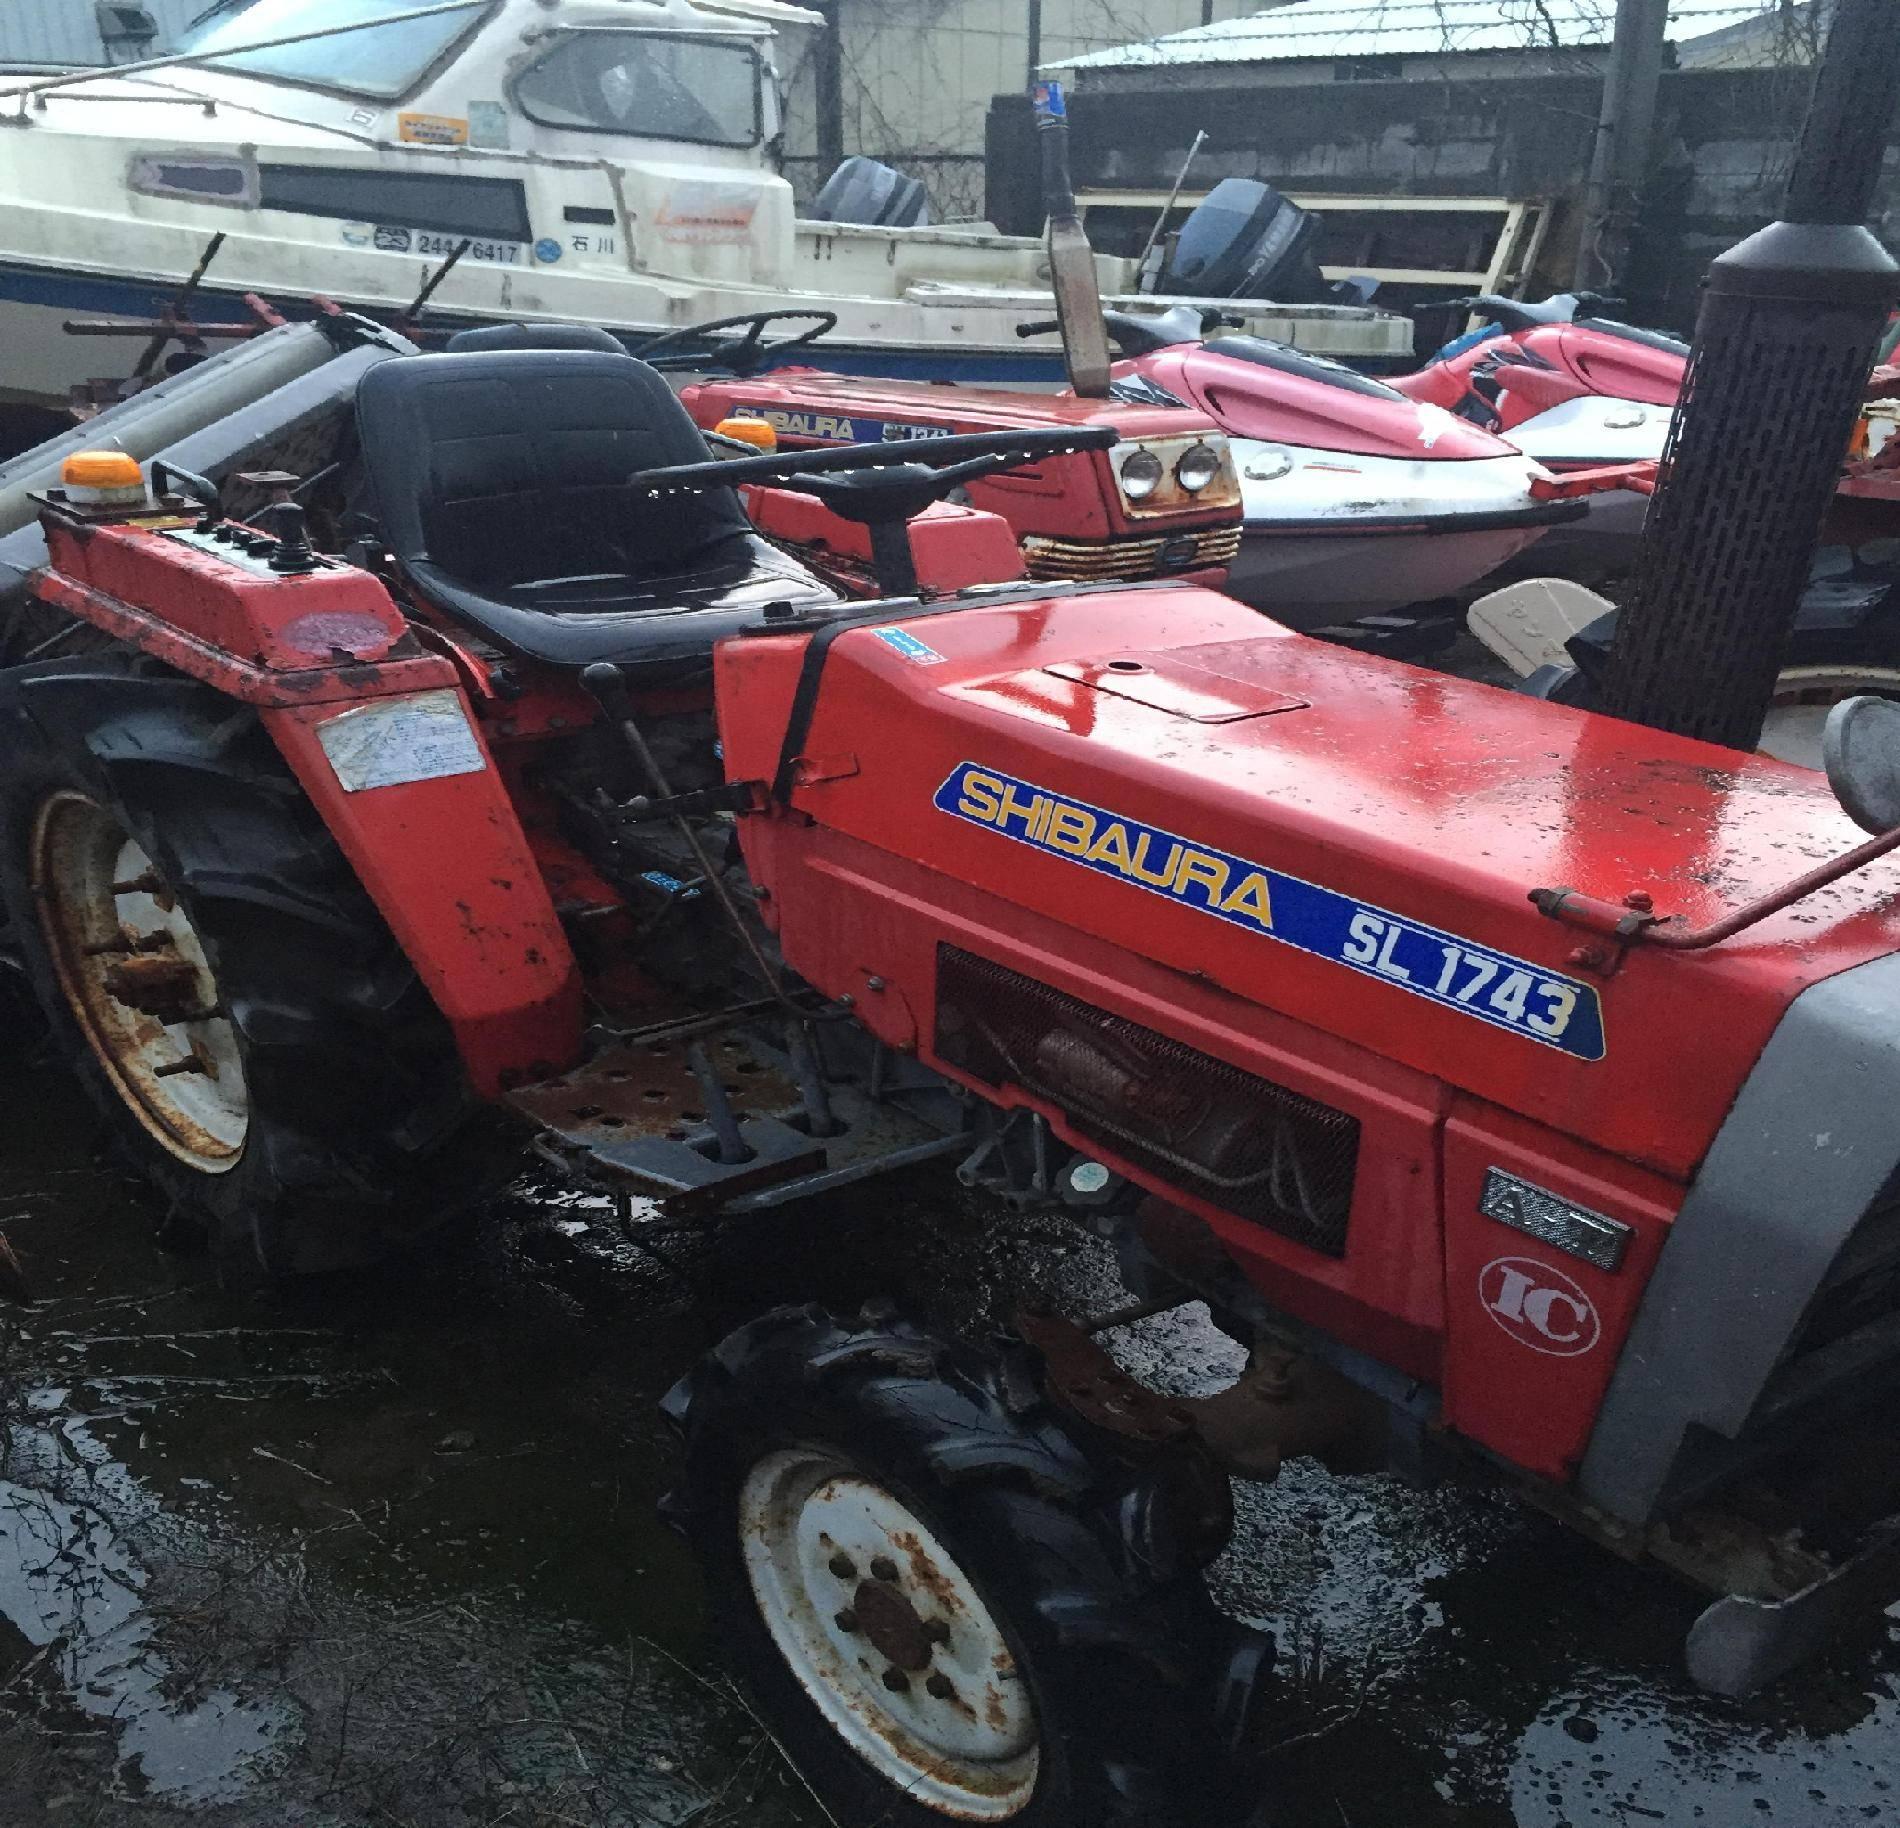 Used tractor Shibaura SL1743 Unit 2